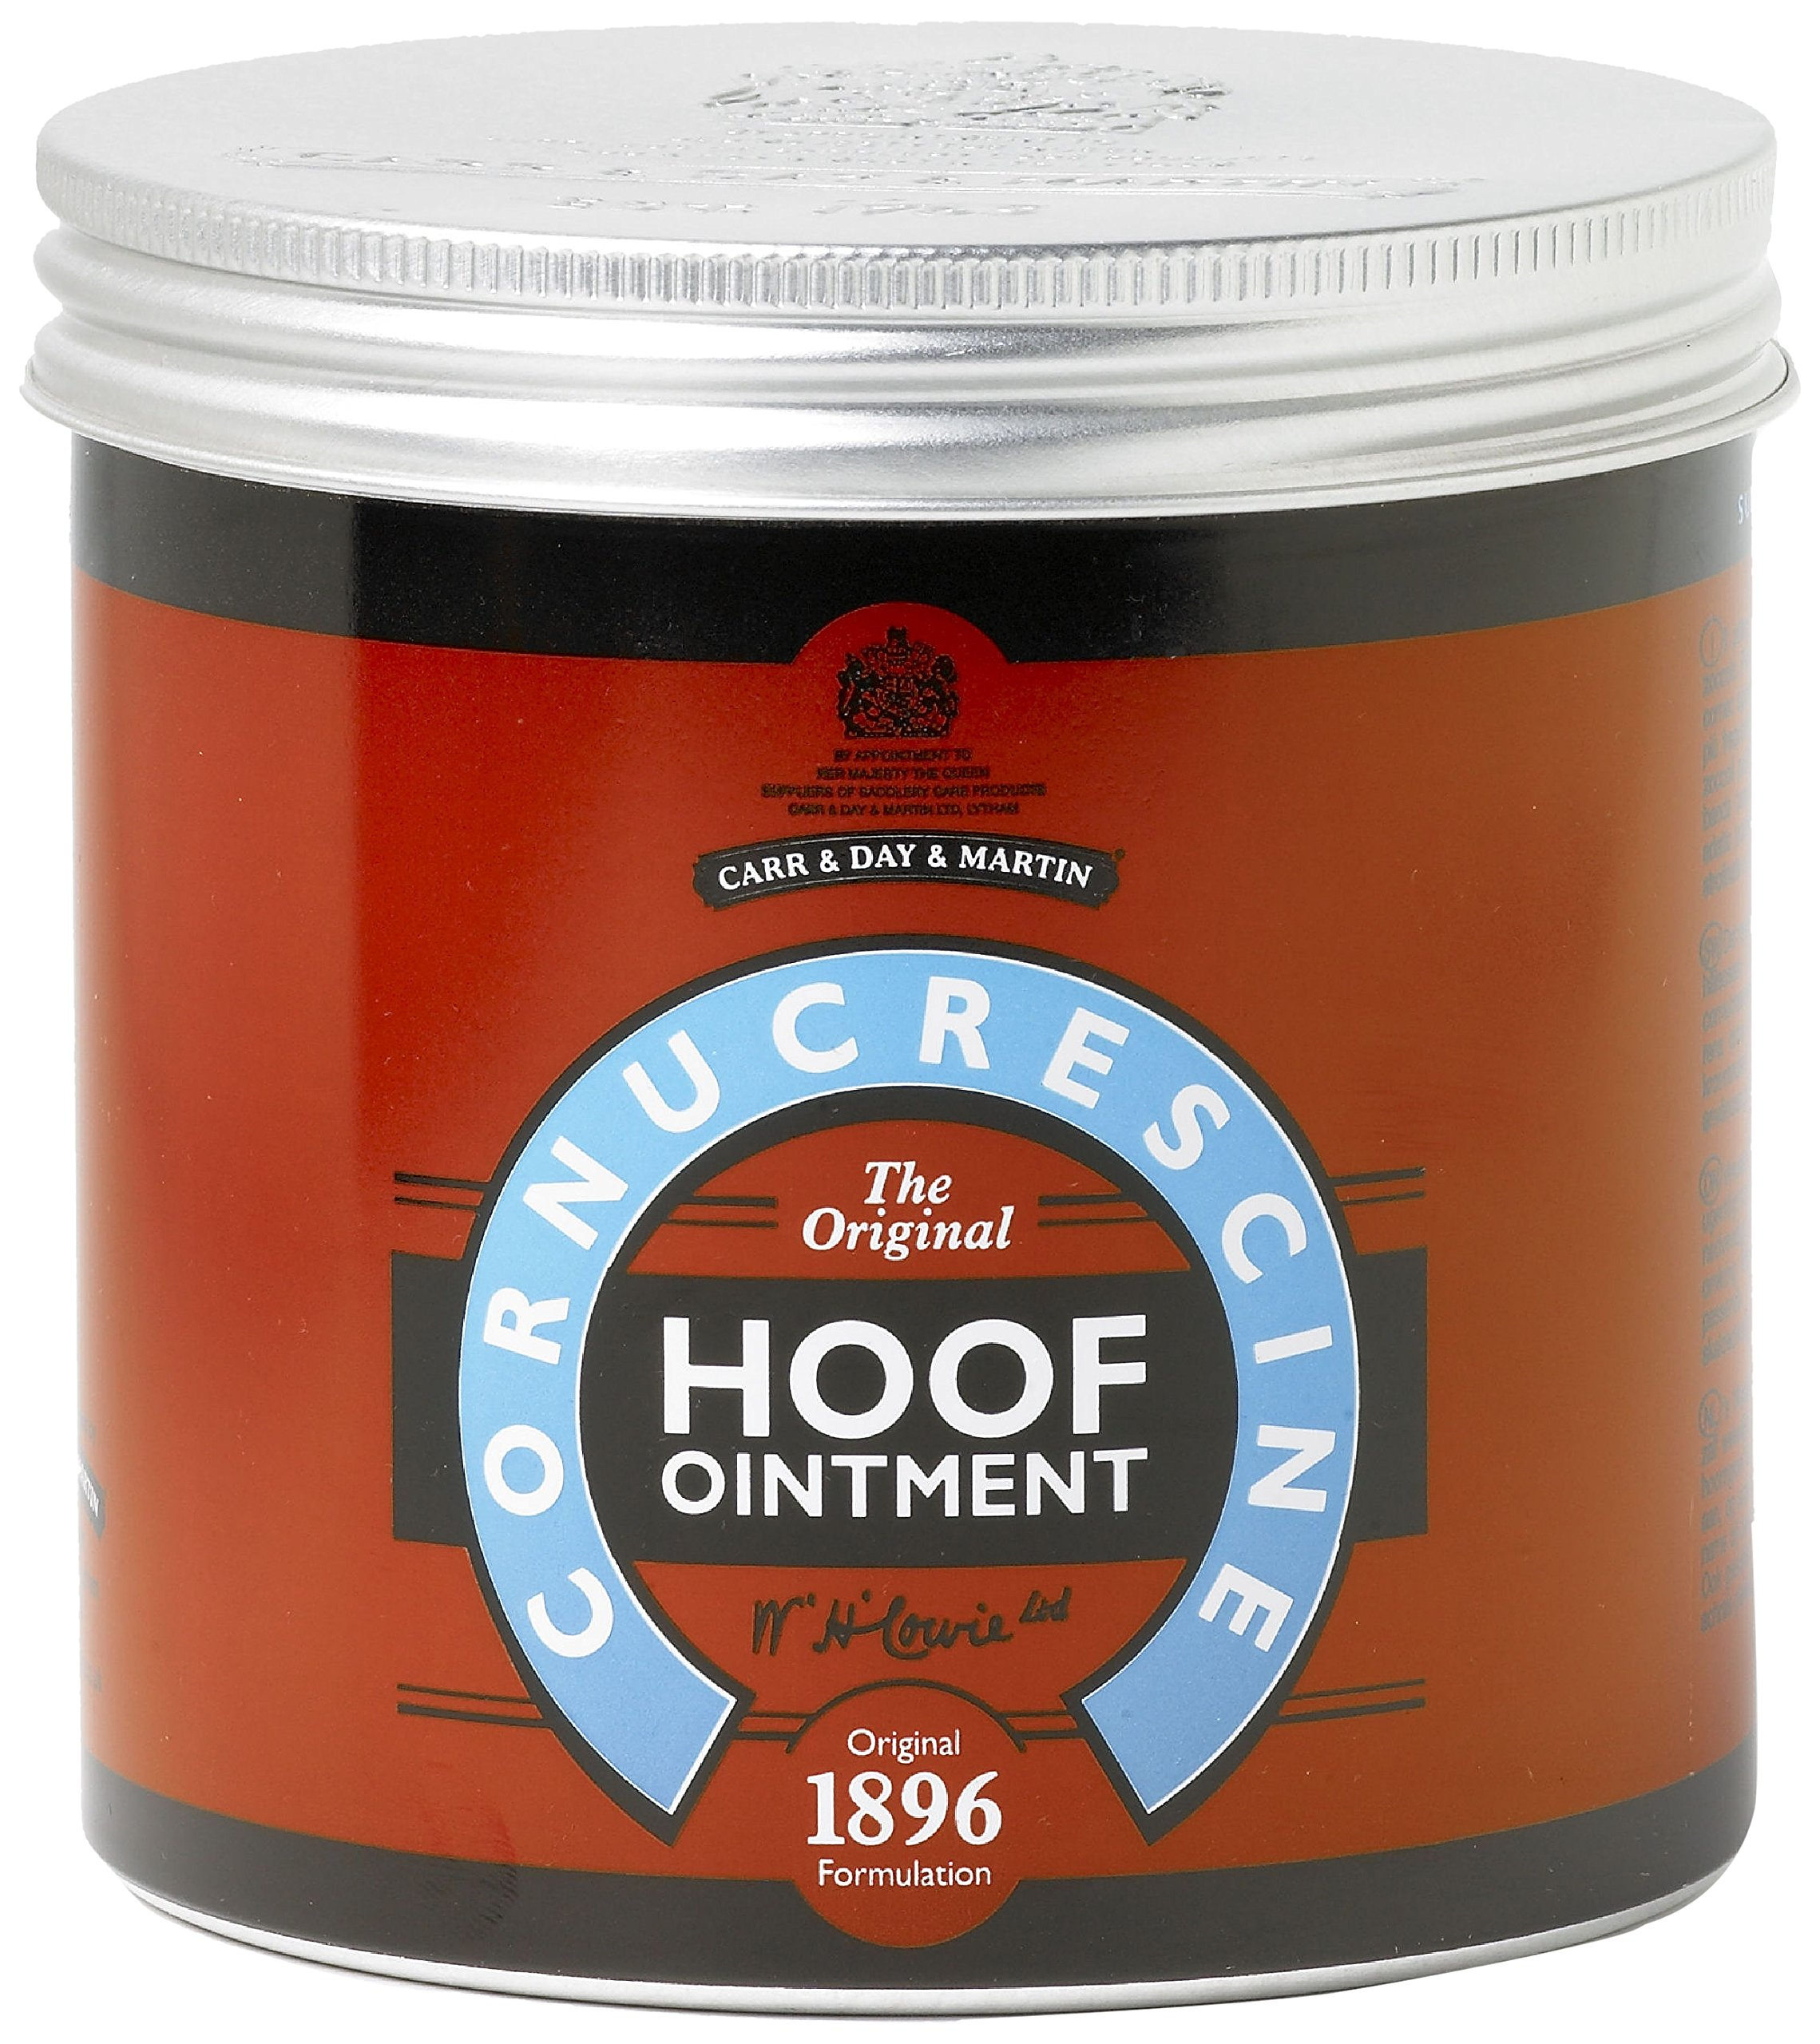 Cornucrescine Original Hoof Ointment - 500 ml by Carr & Day & Martin